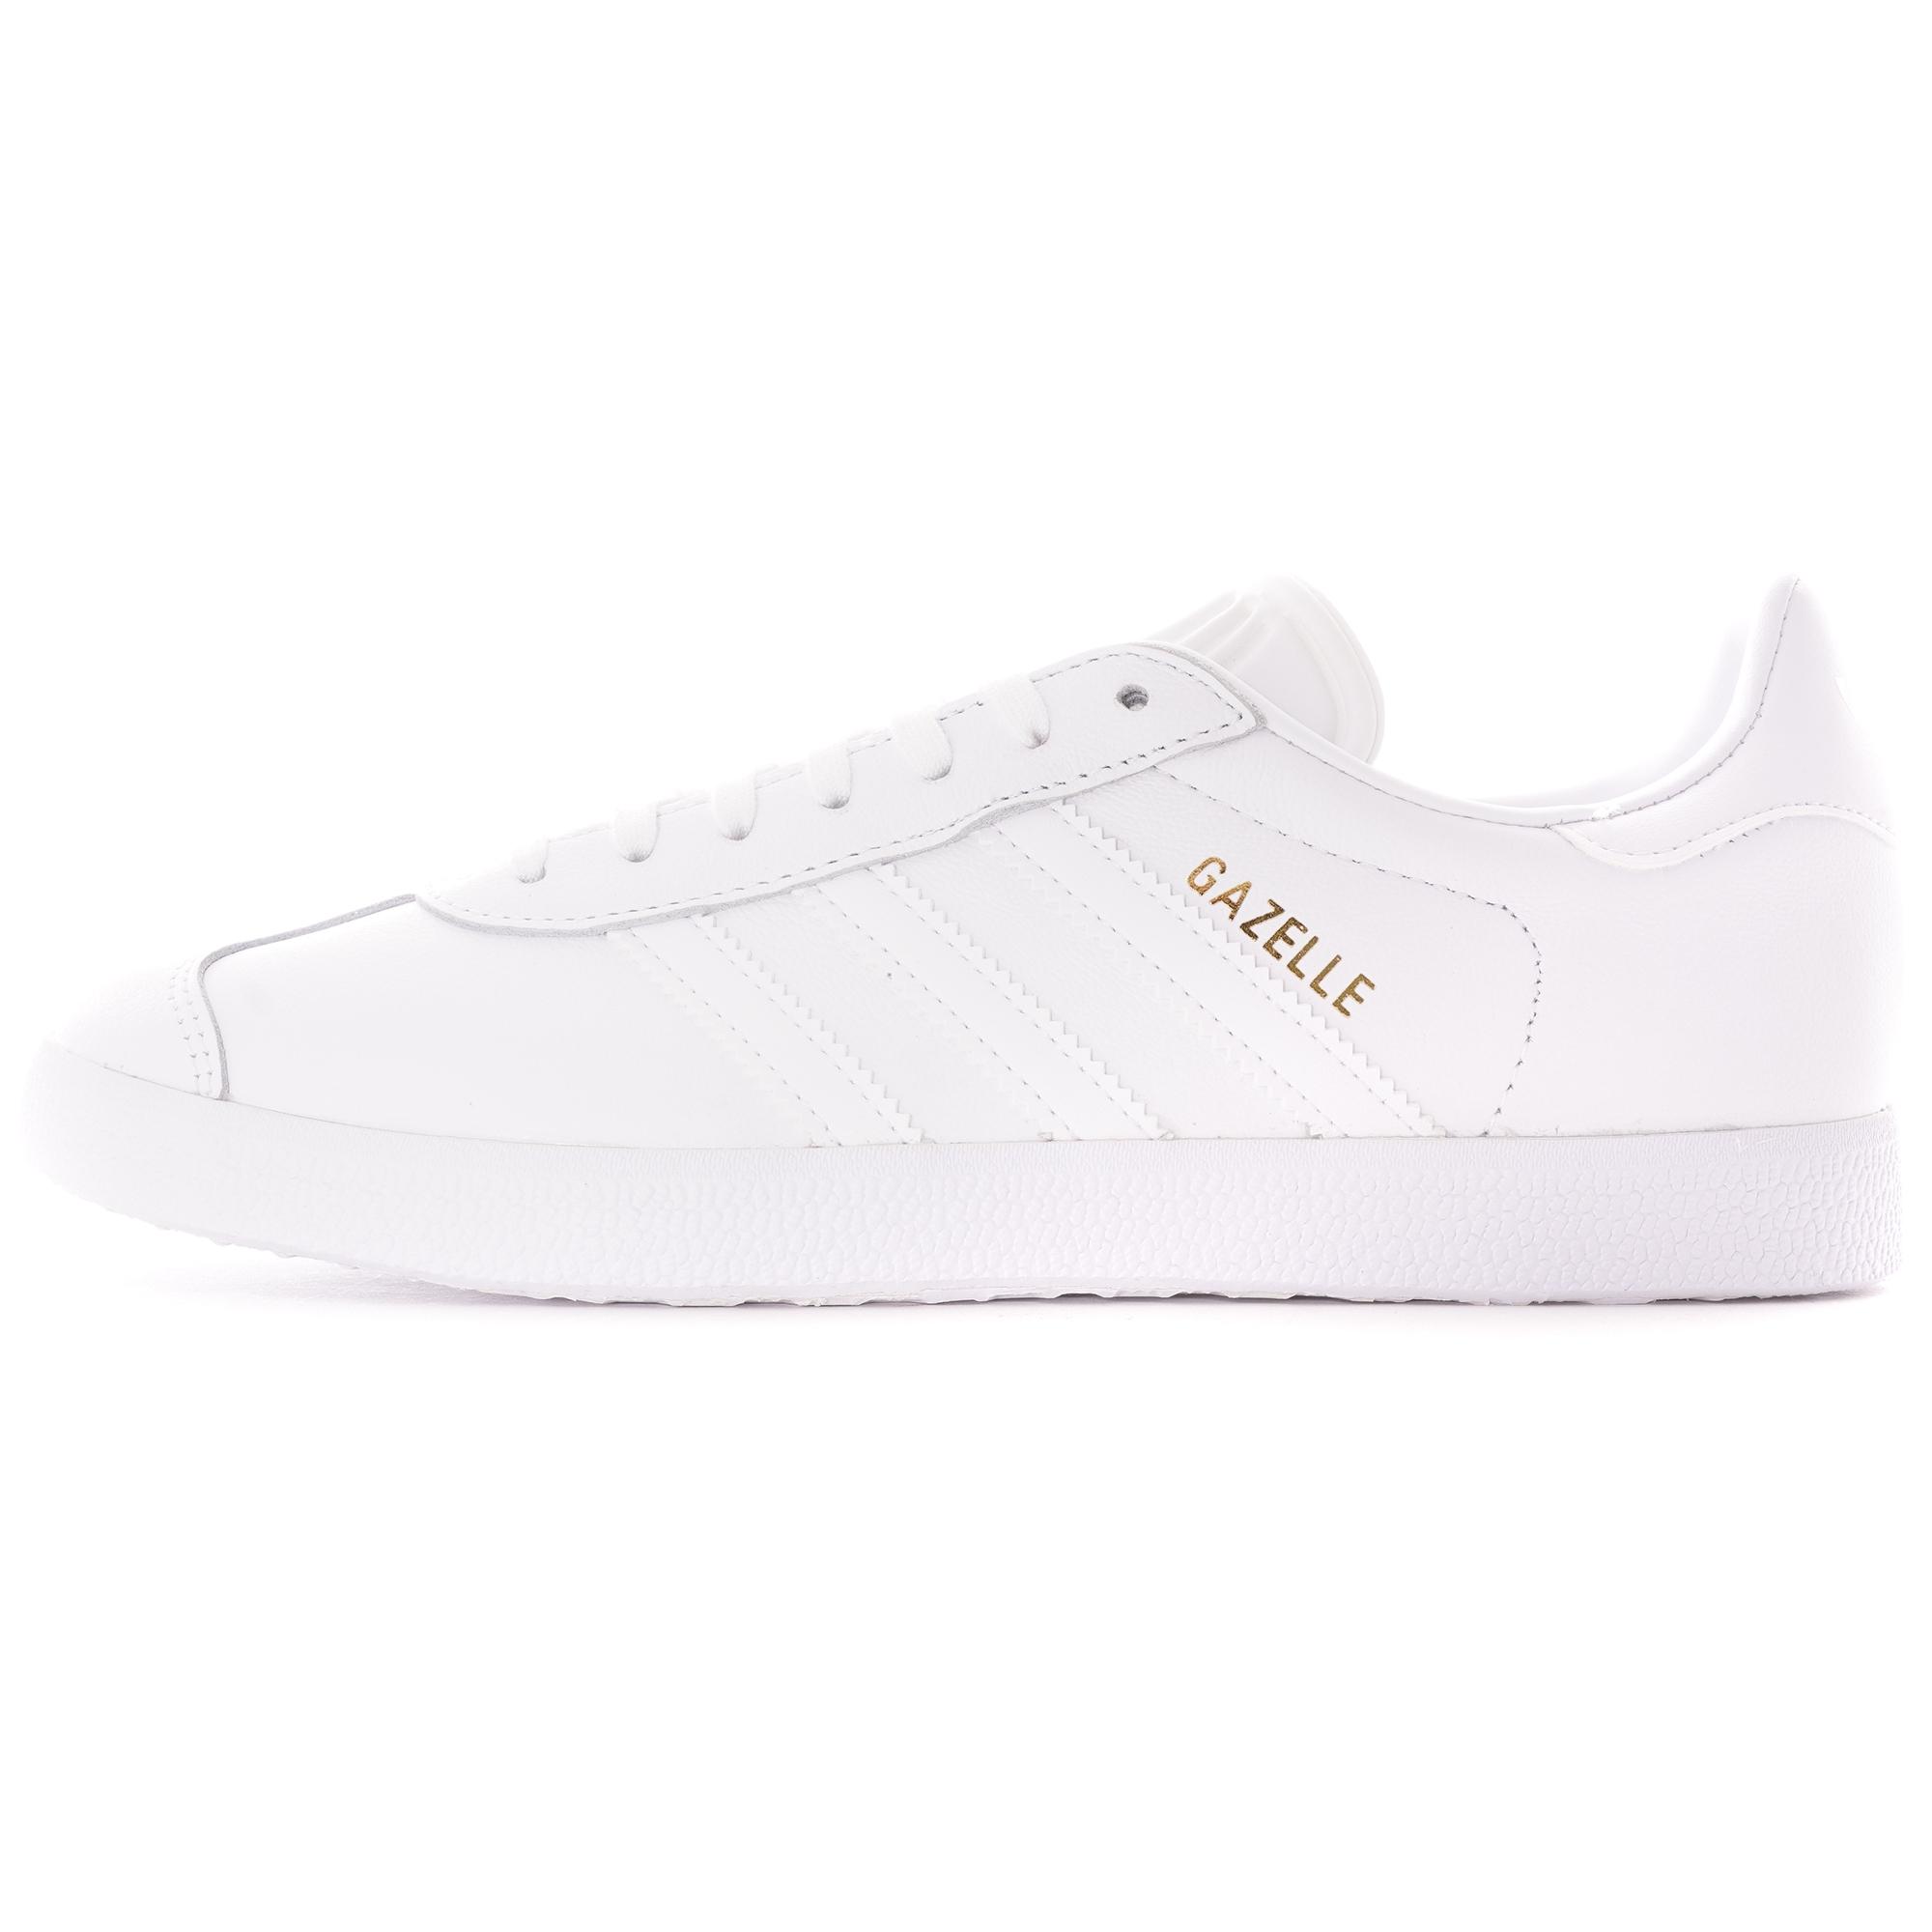 Adidas Originals Gazelle | White